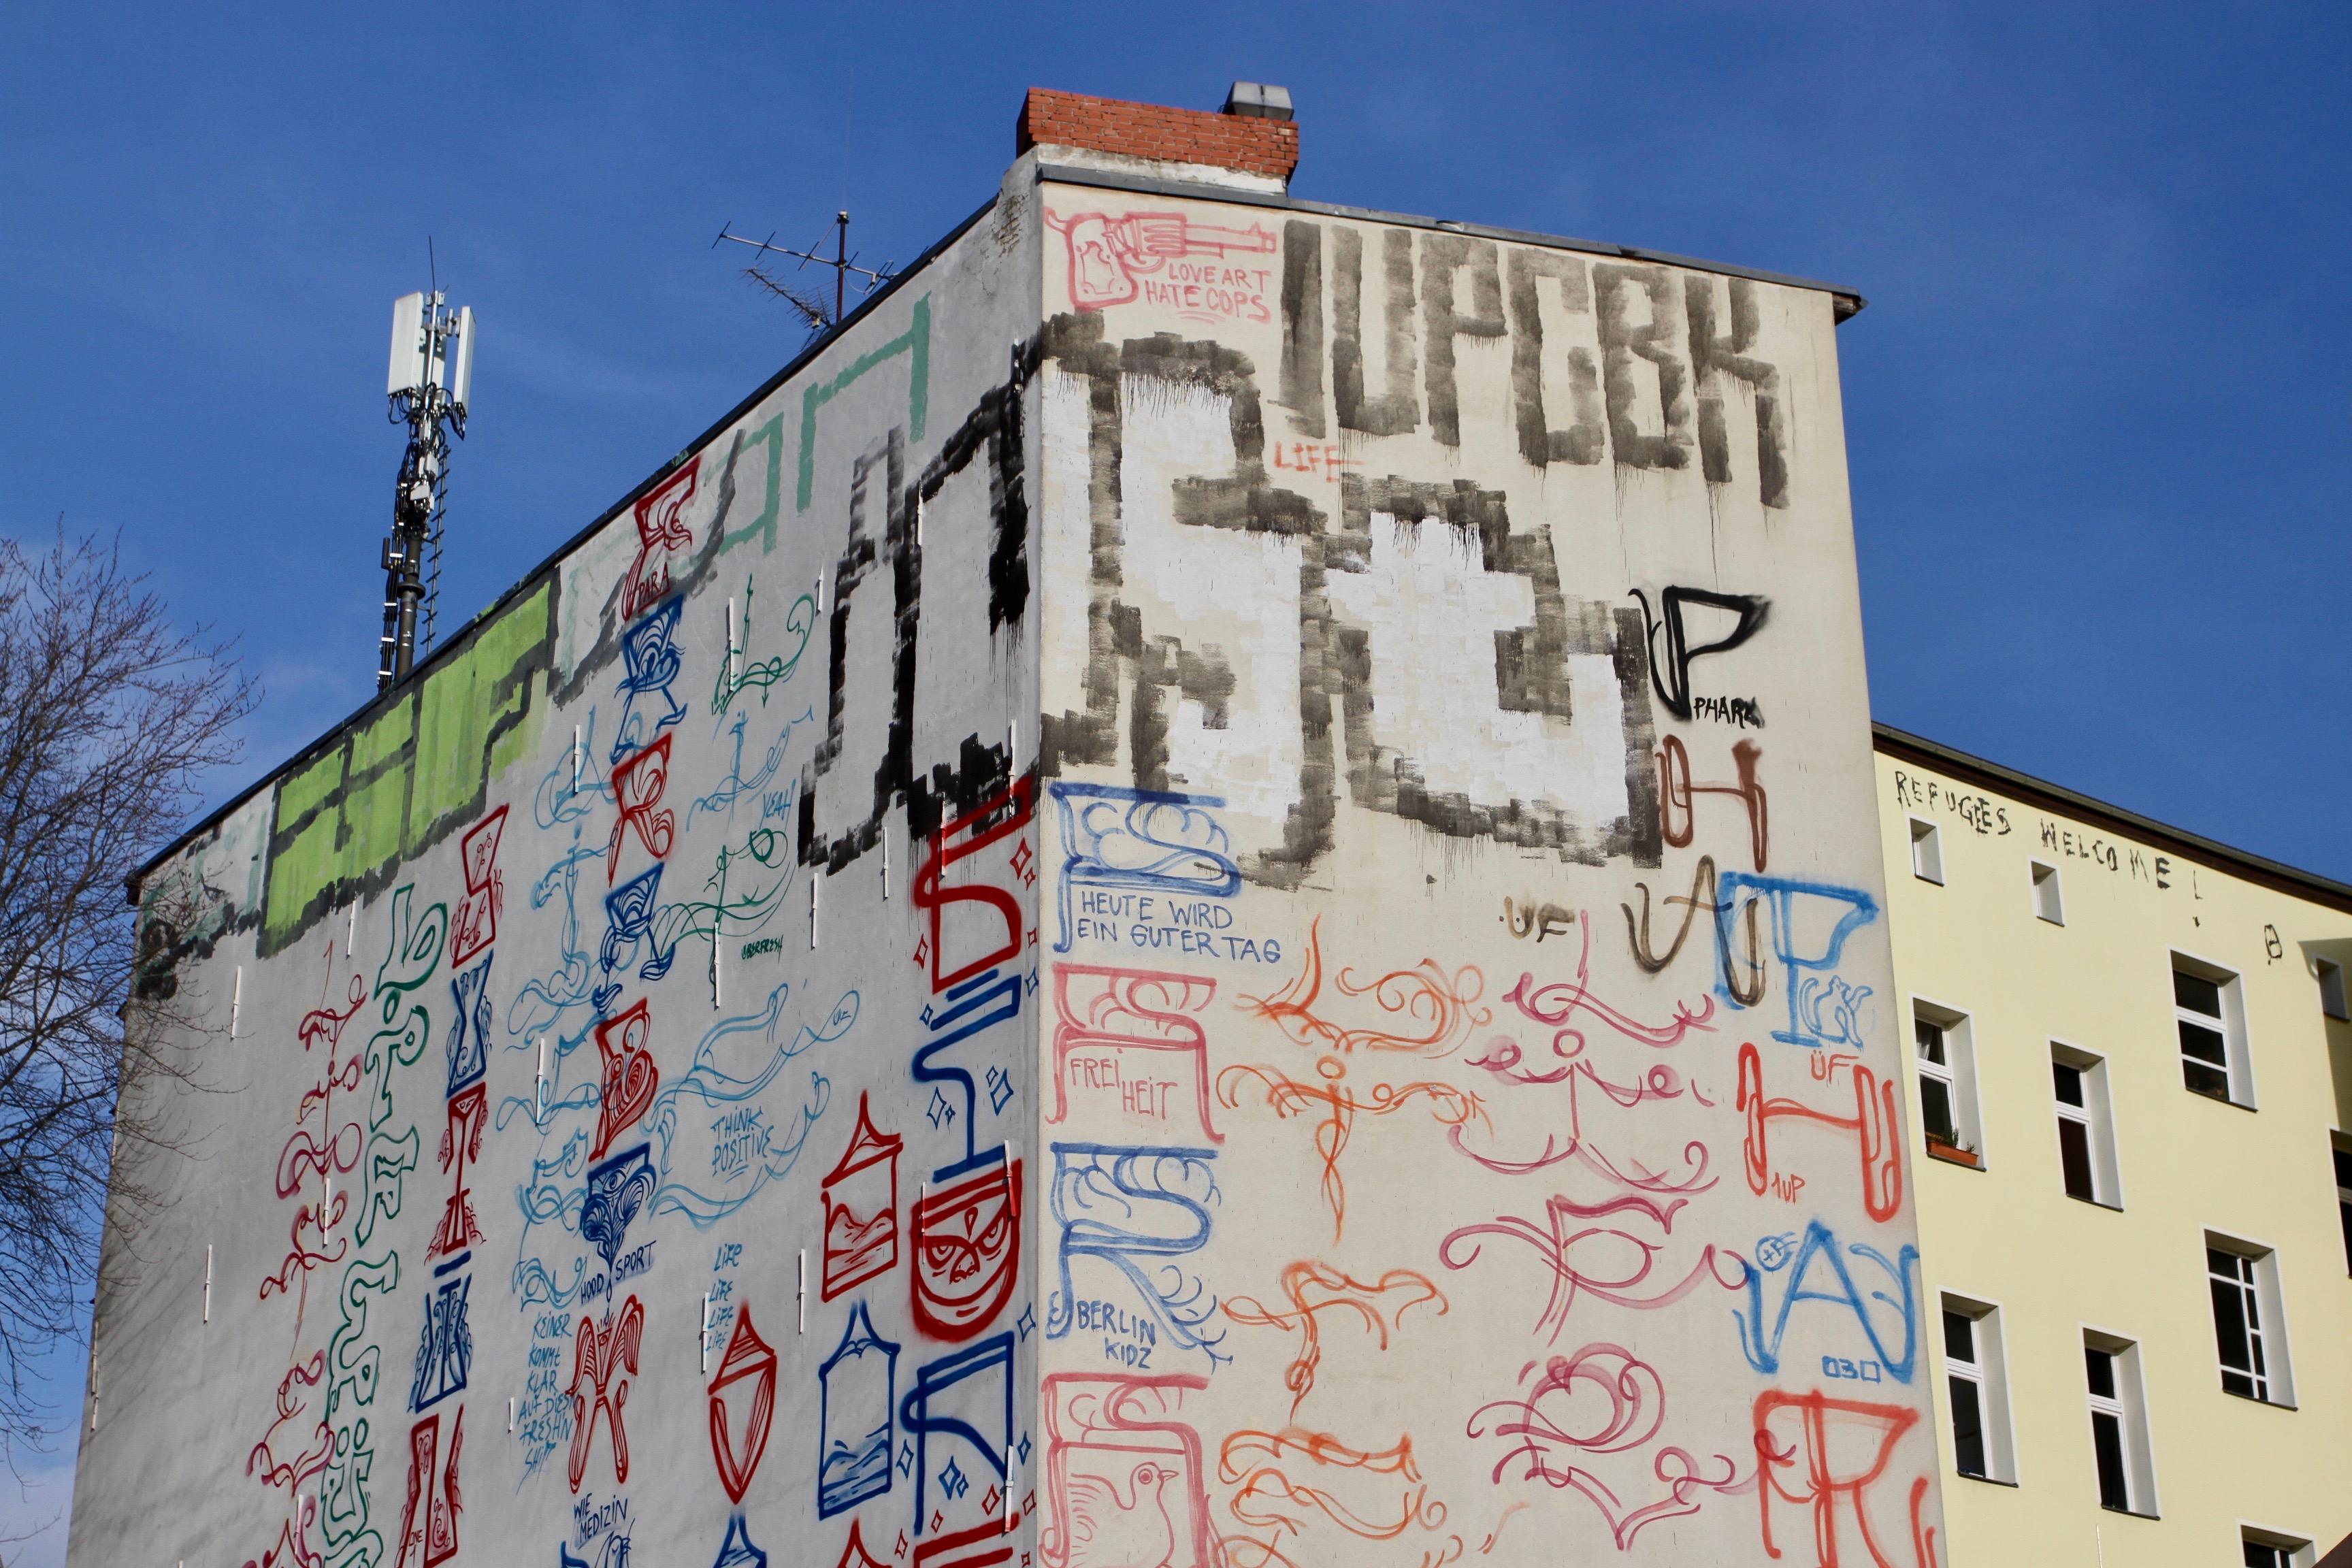 Berlin Kidz, Berlin Street Art, Germany